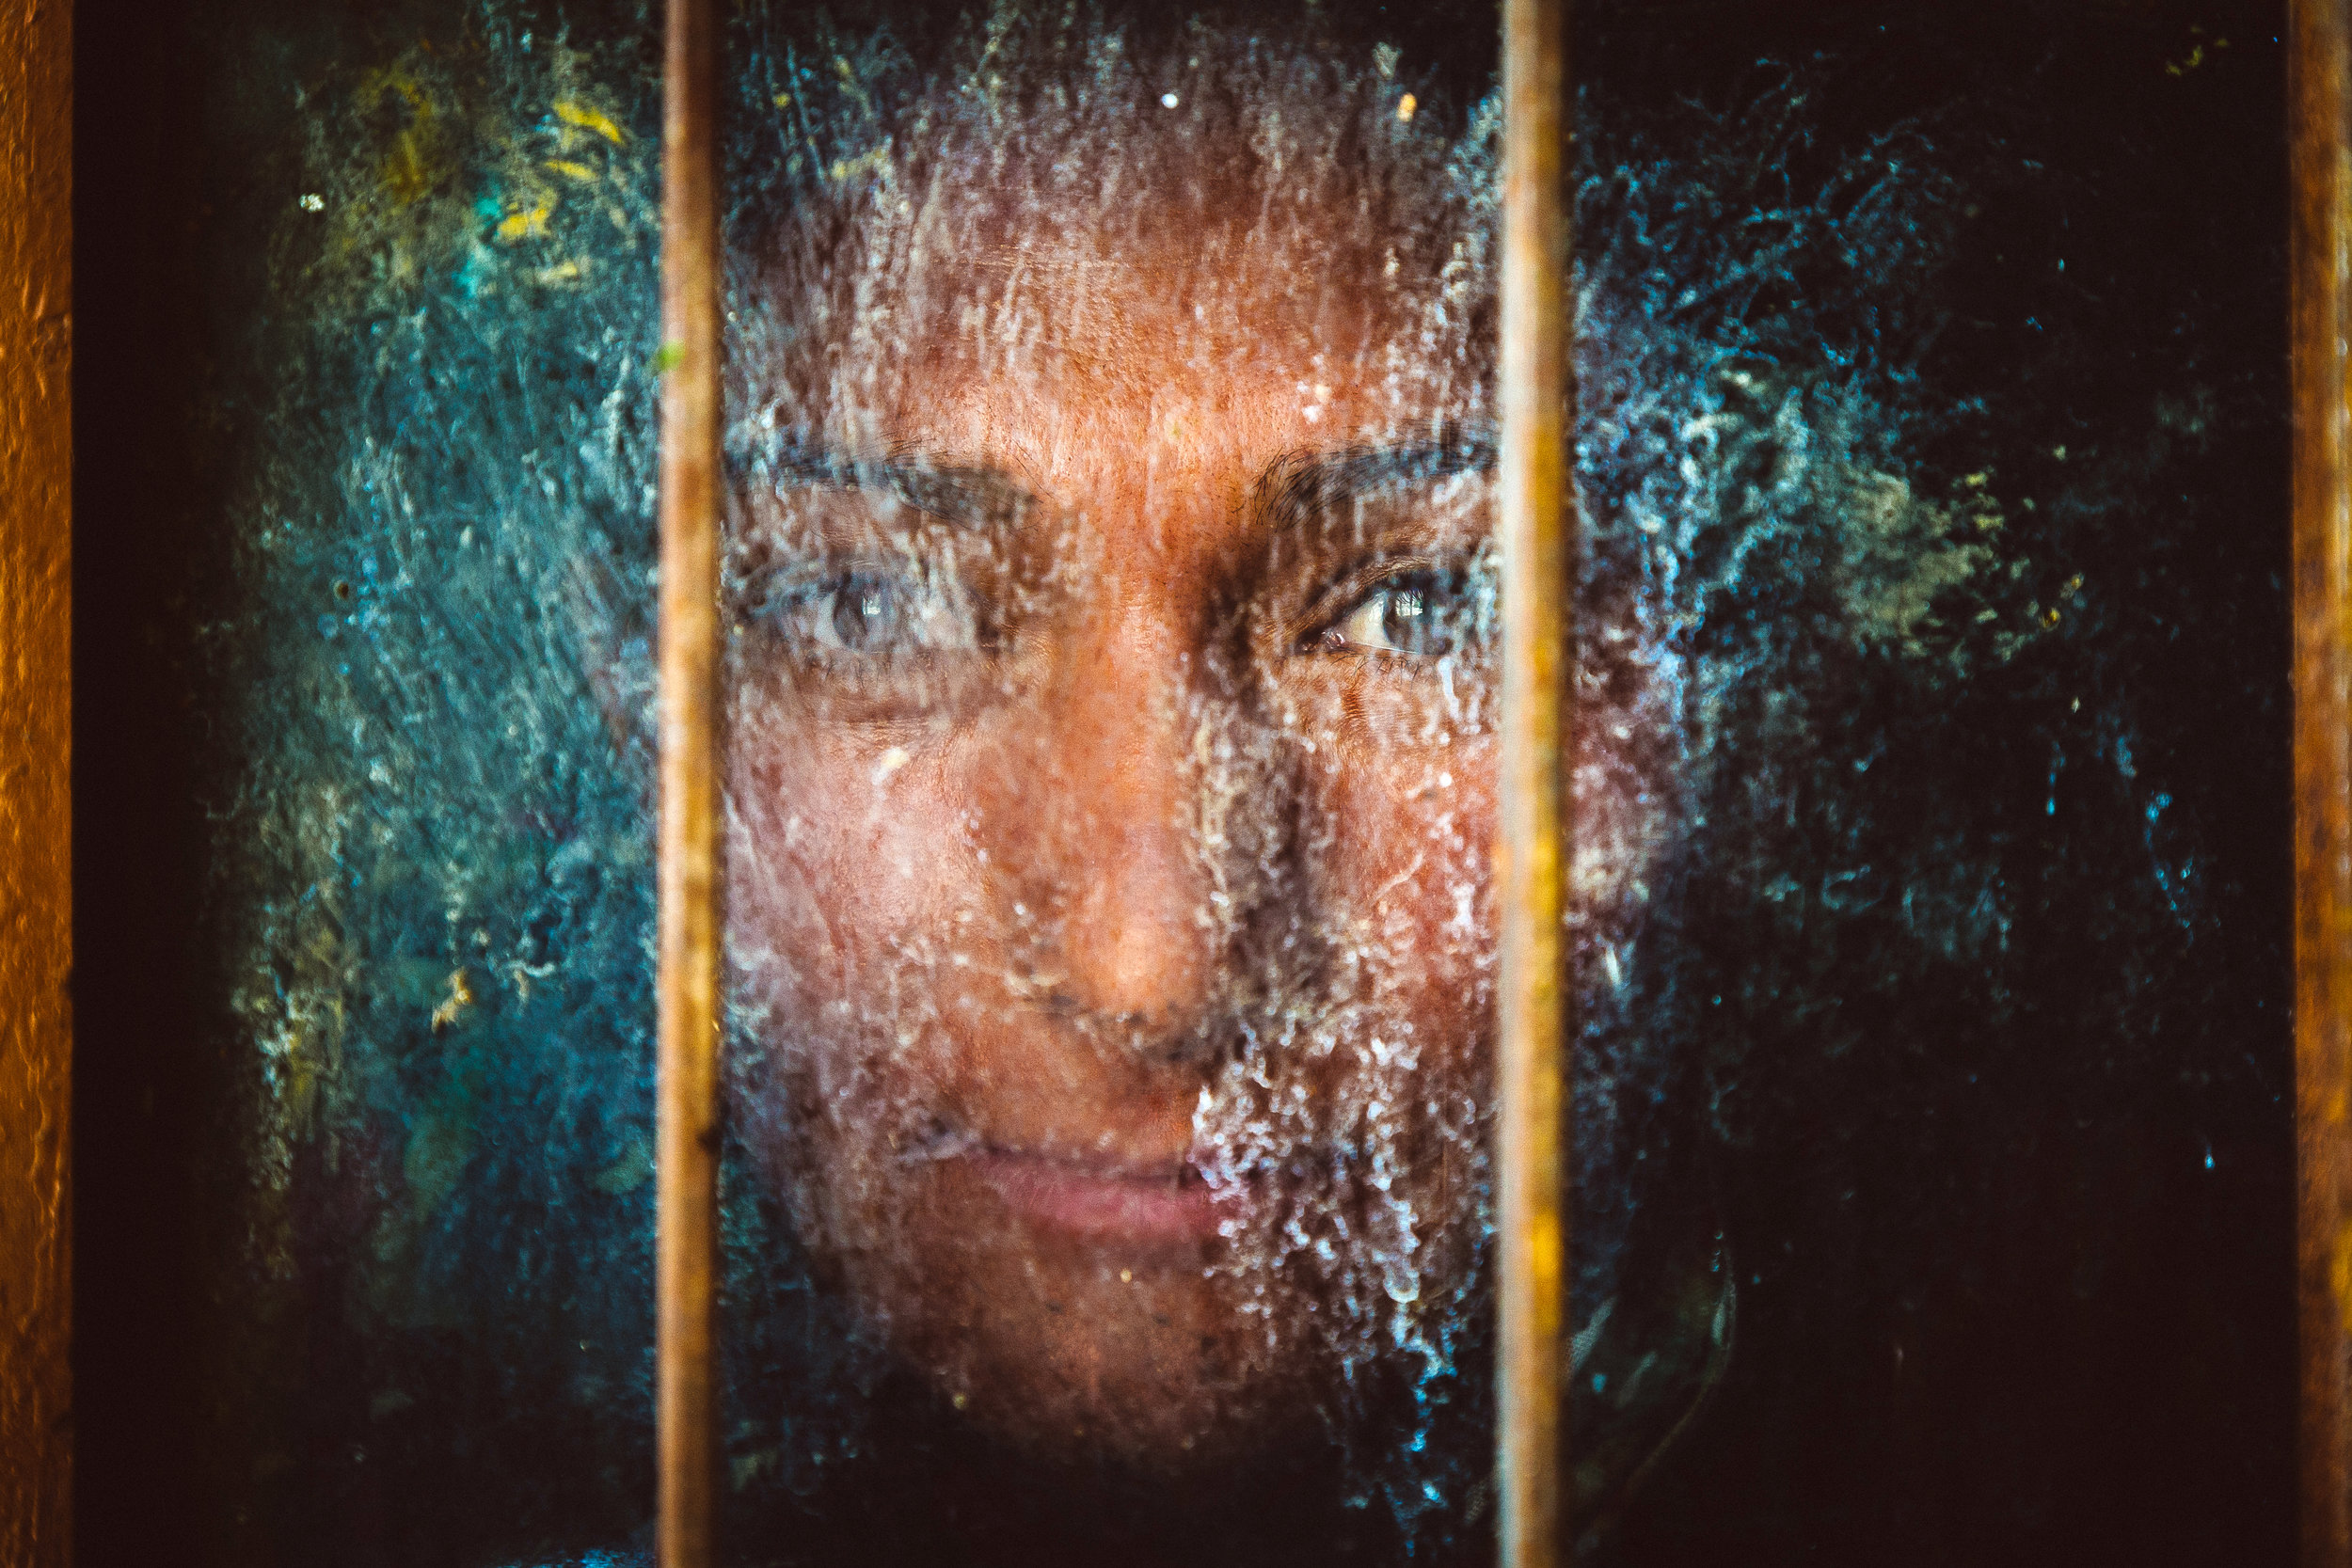 An Aryan woman looking through a dirty old window in an Aryan vi